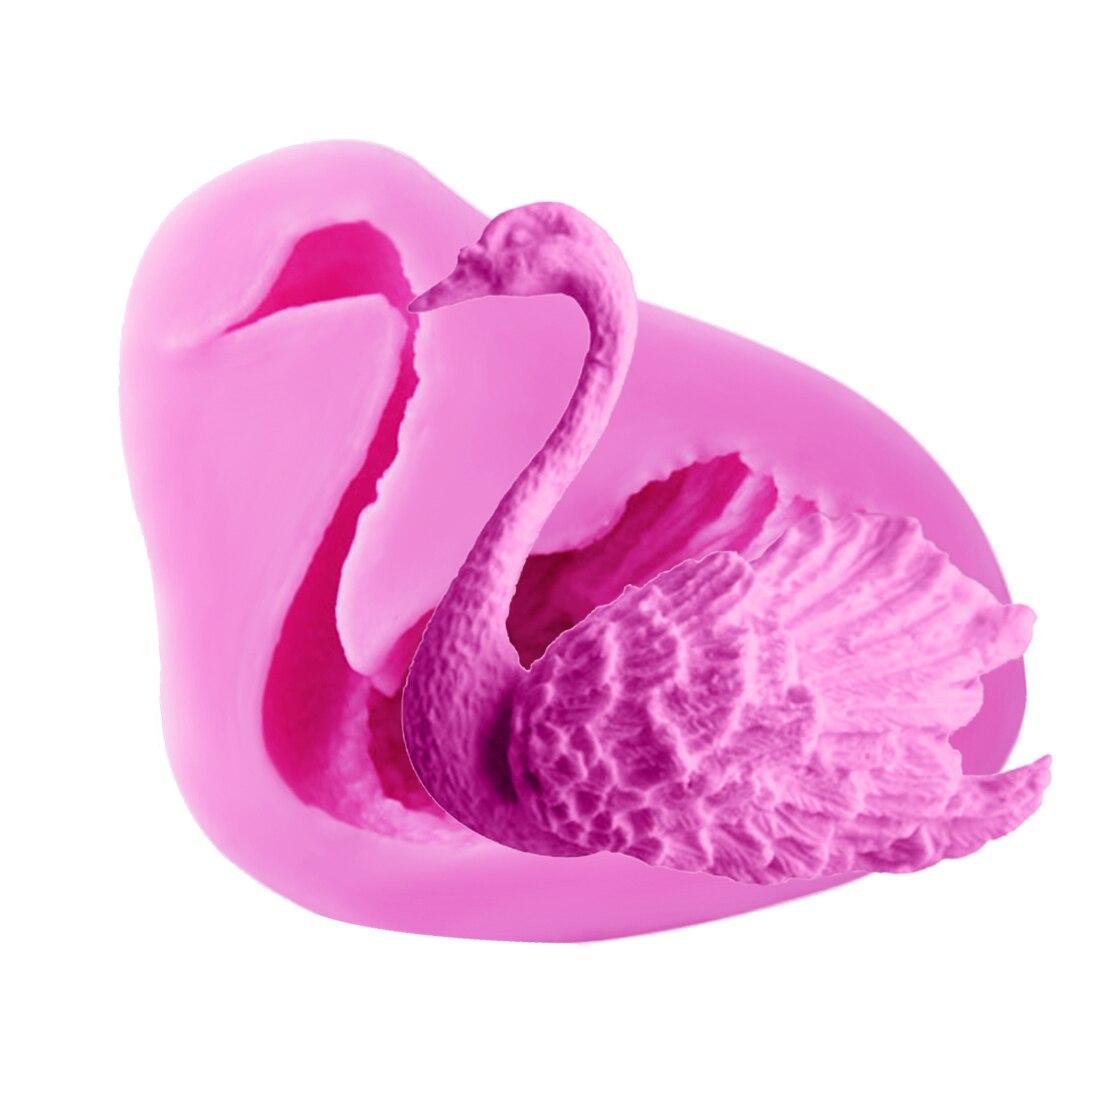 ②Caramelo 1 unid 3D Cisne forma silicona chocolate jabón molde ...